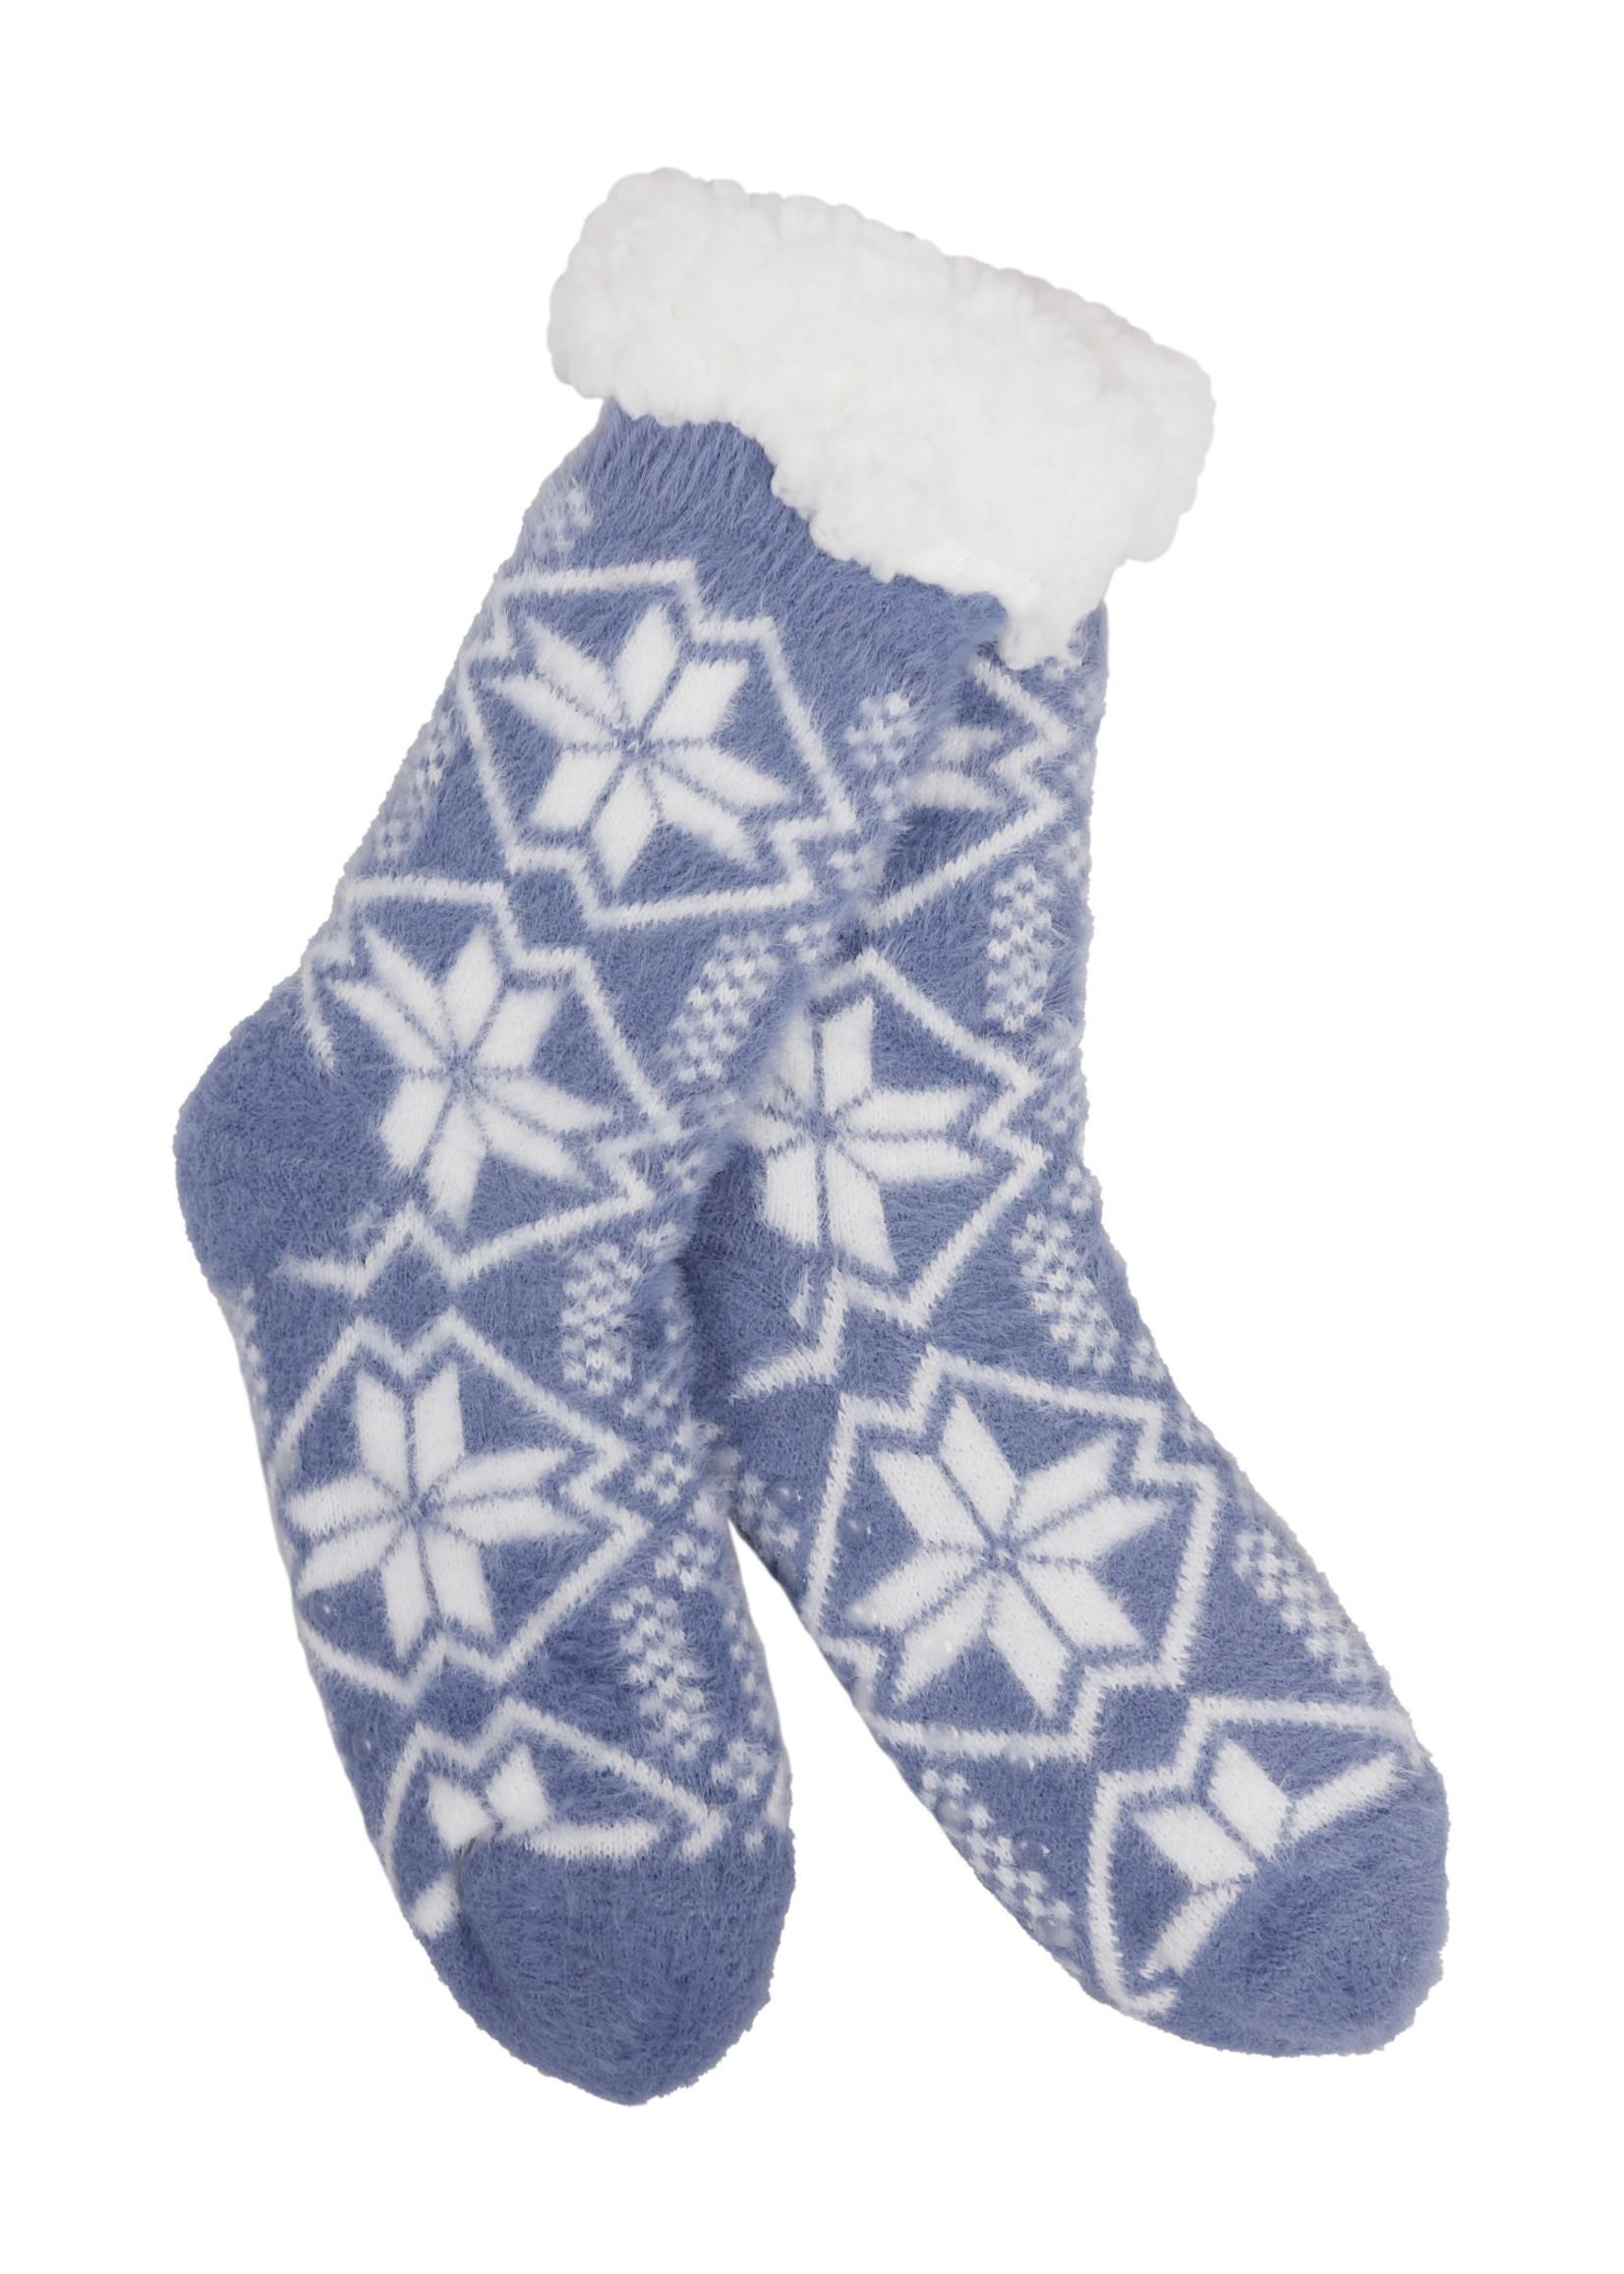 Fashion by Mirabeau Story Snowflakes Thermal Slipper Socks